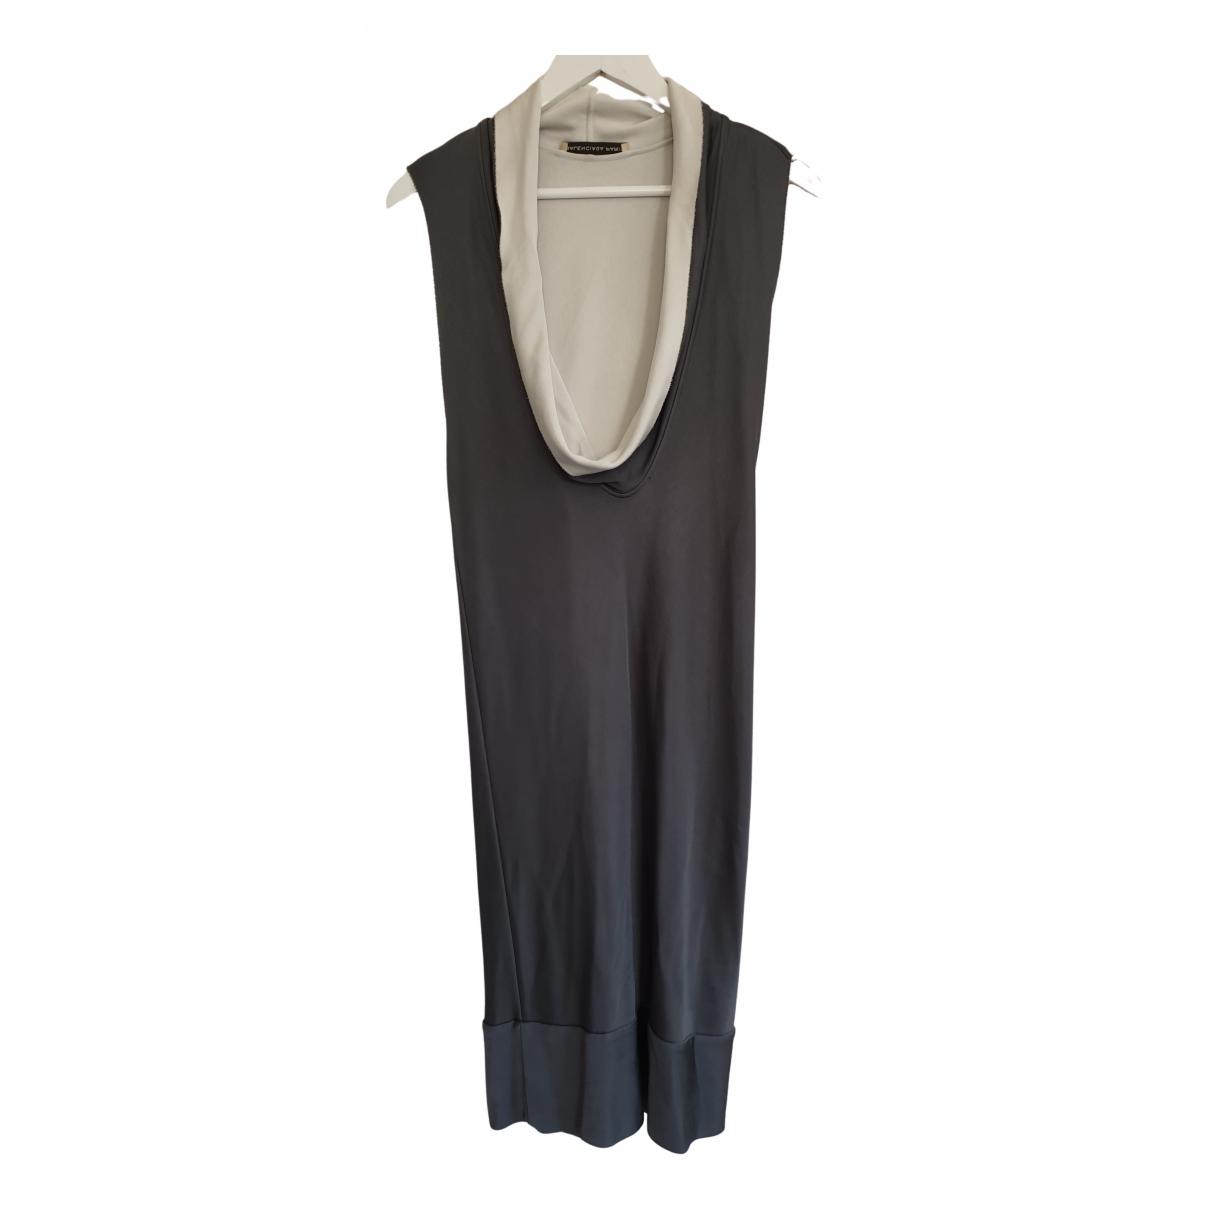 Balenciaga \N Kleid in  Anthrazit Viskose